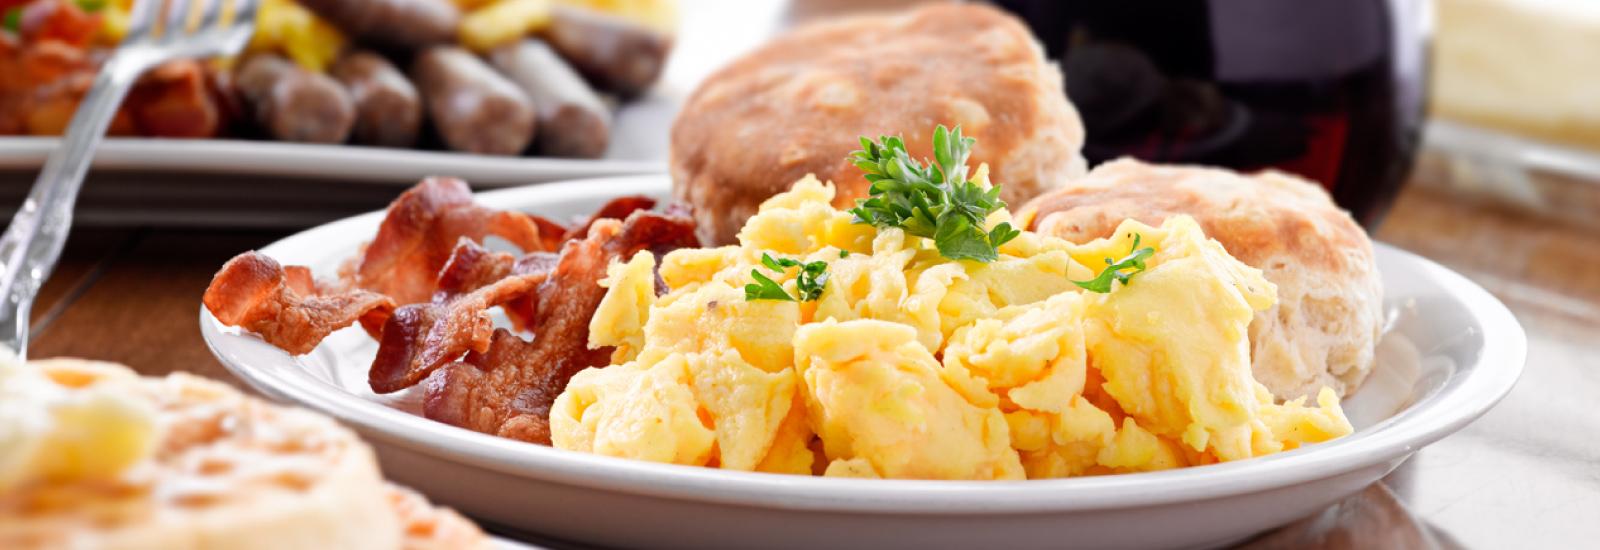 Breakfast Restaurants in Panama City